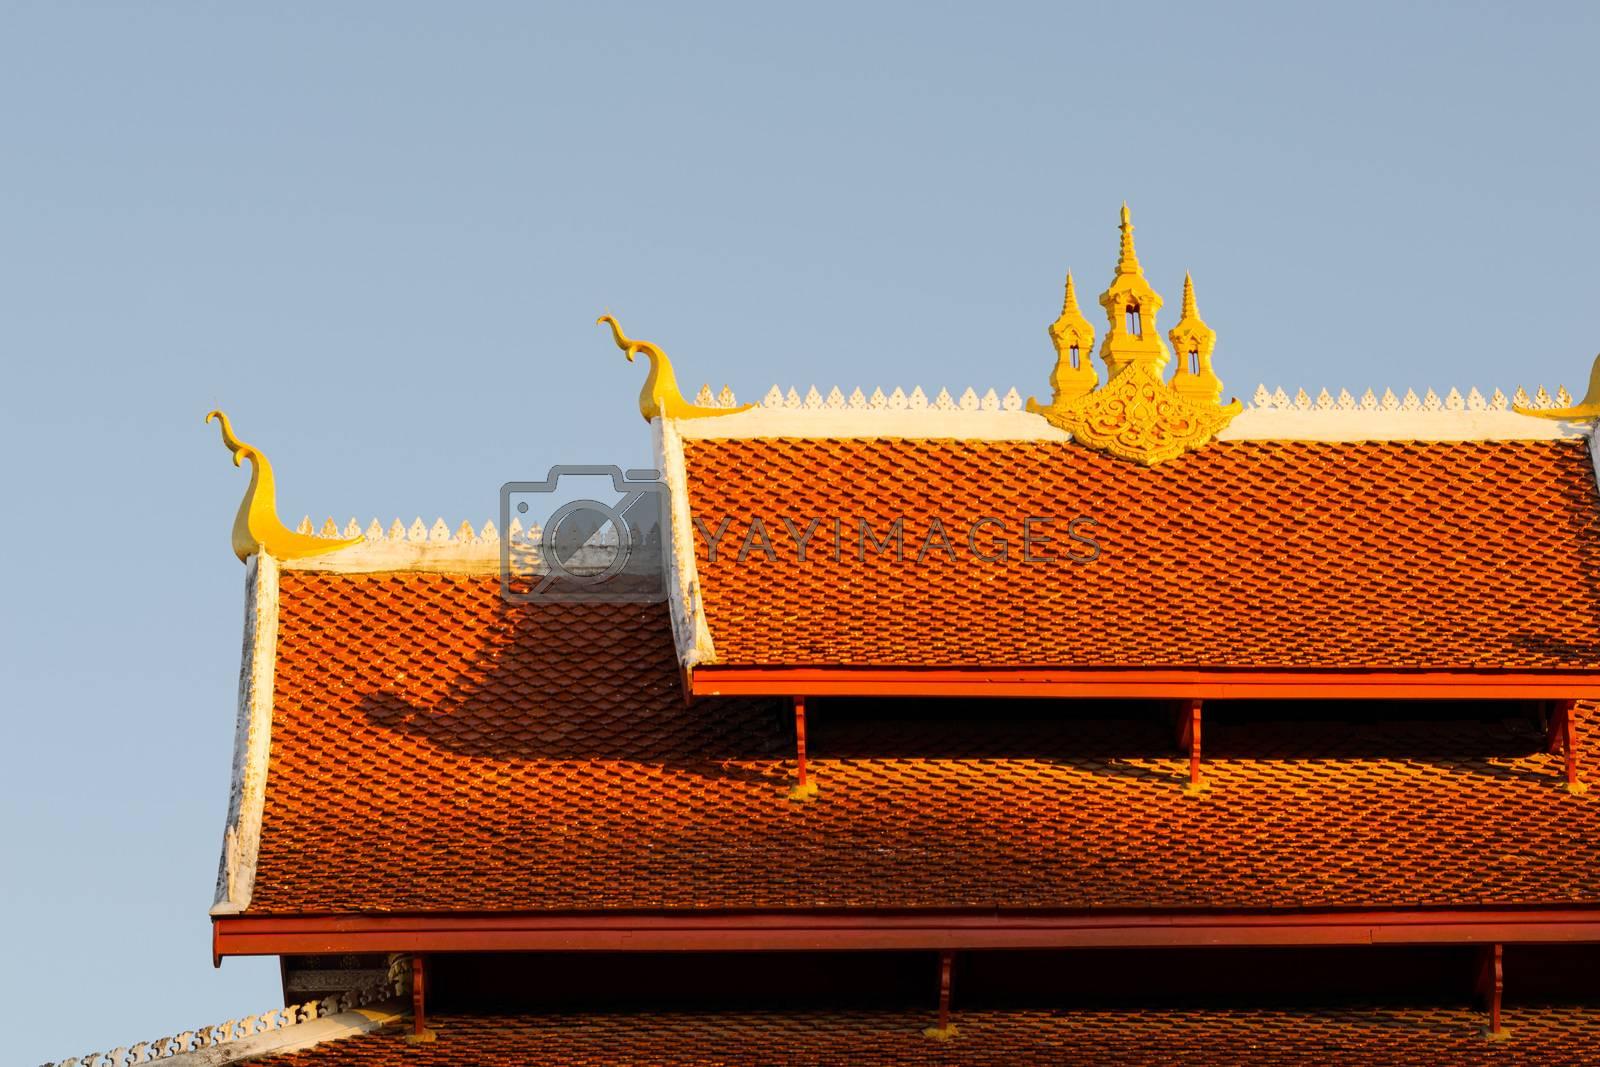 Wat Mai Buddhist temple in Luang Prabang, Laos, at sunset